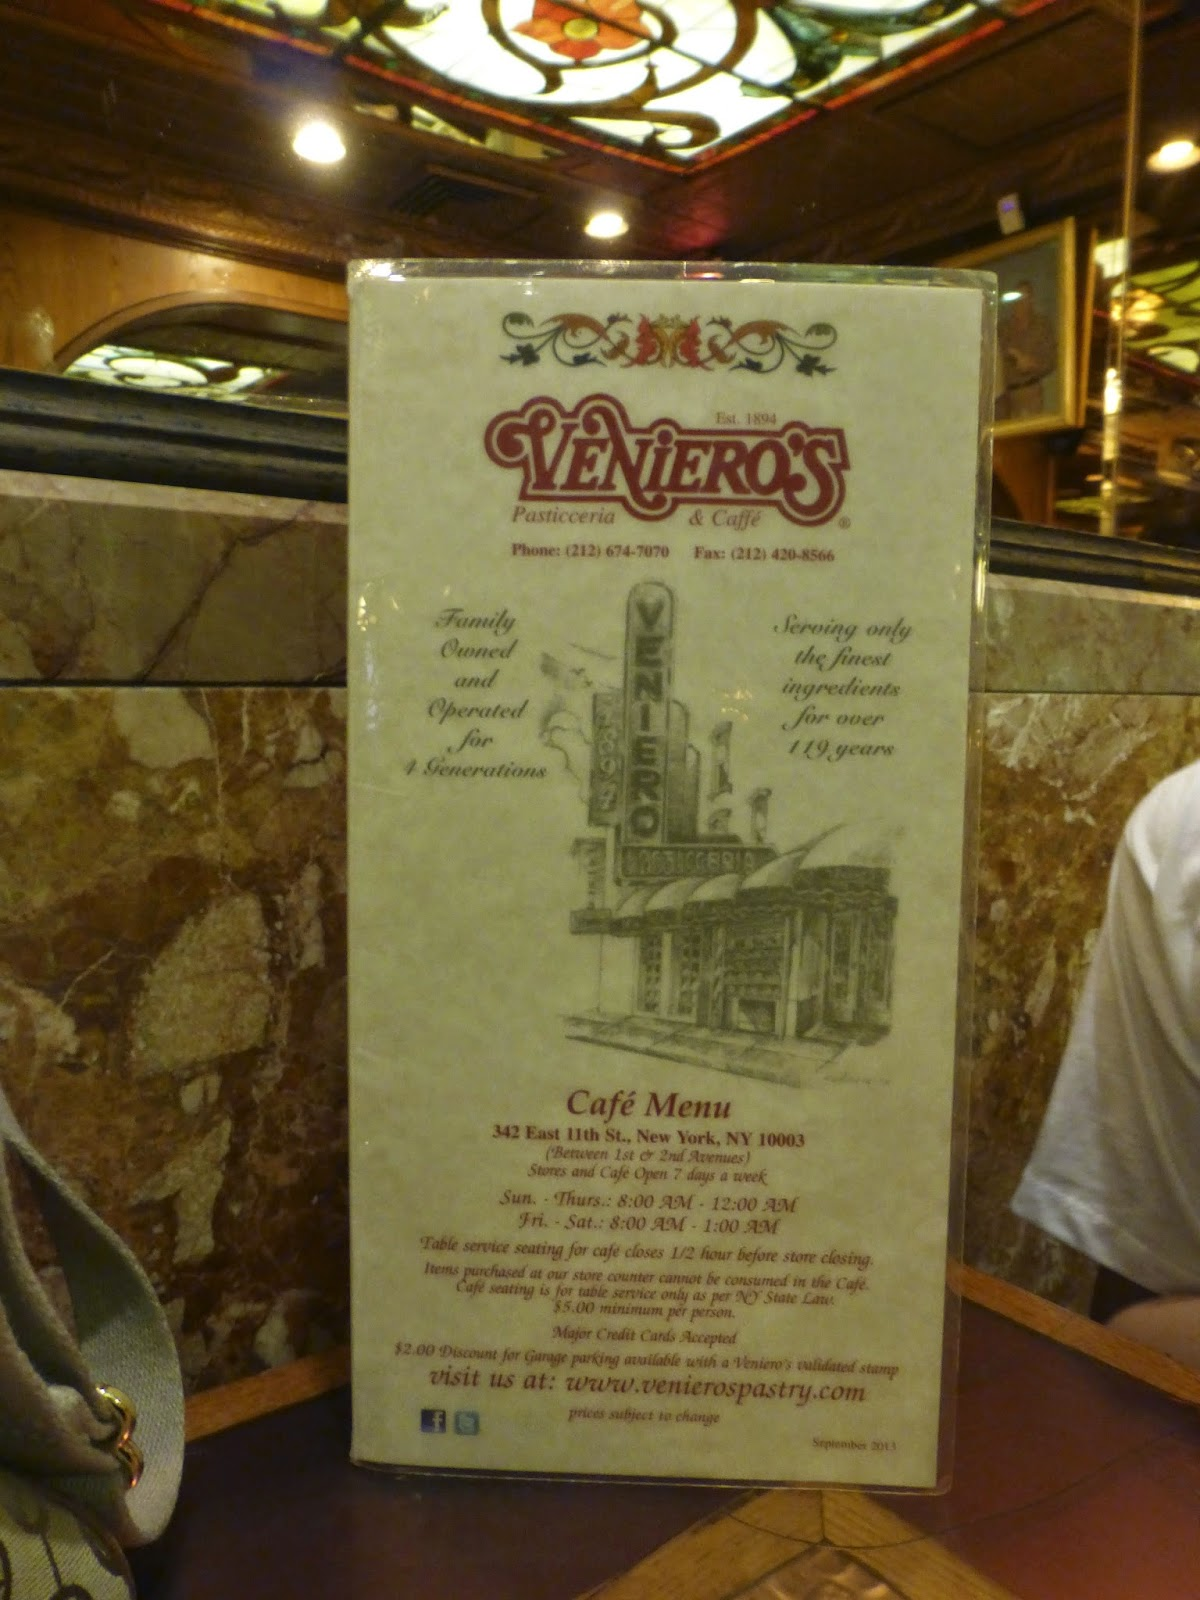 Best Mexican Food Near Rockefeller Center